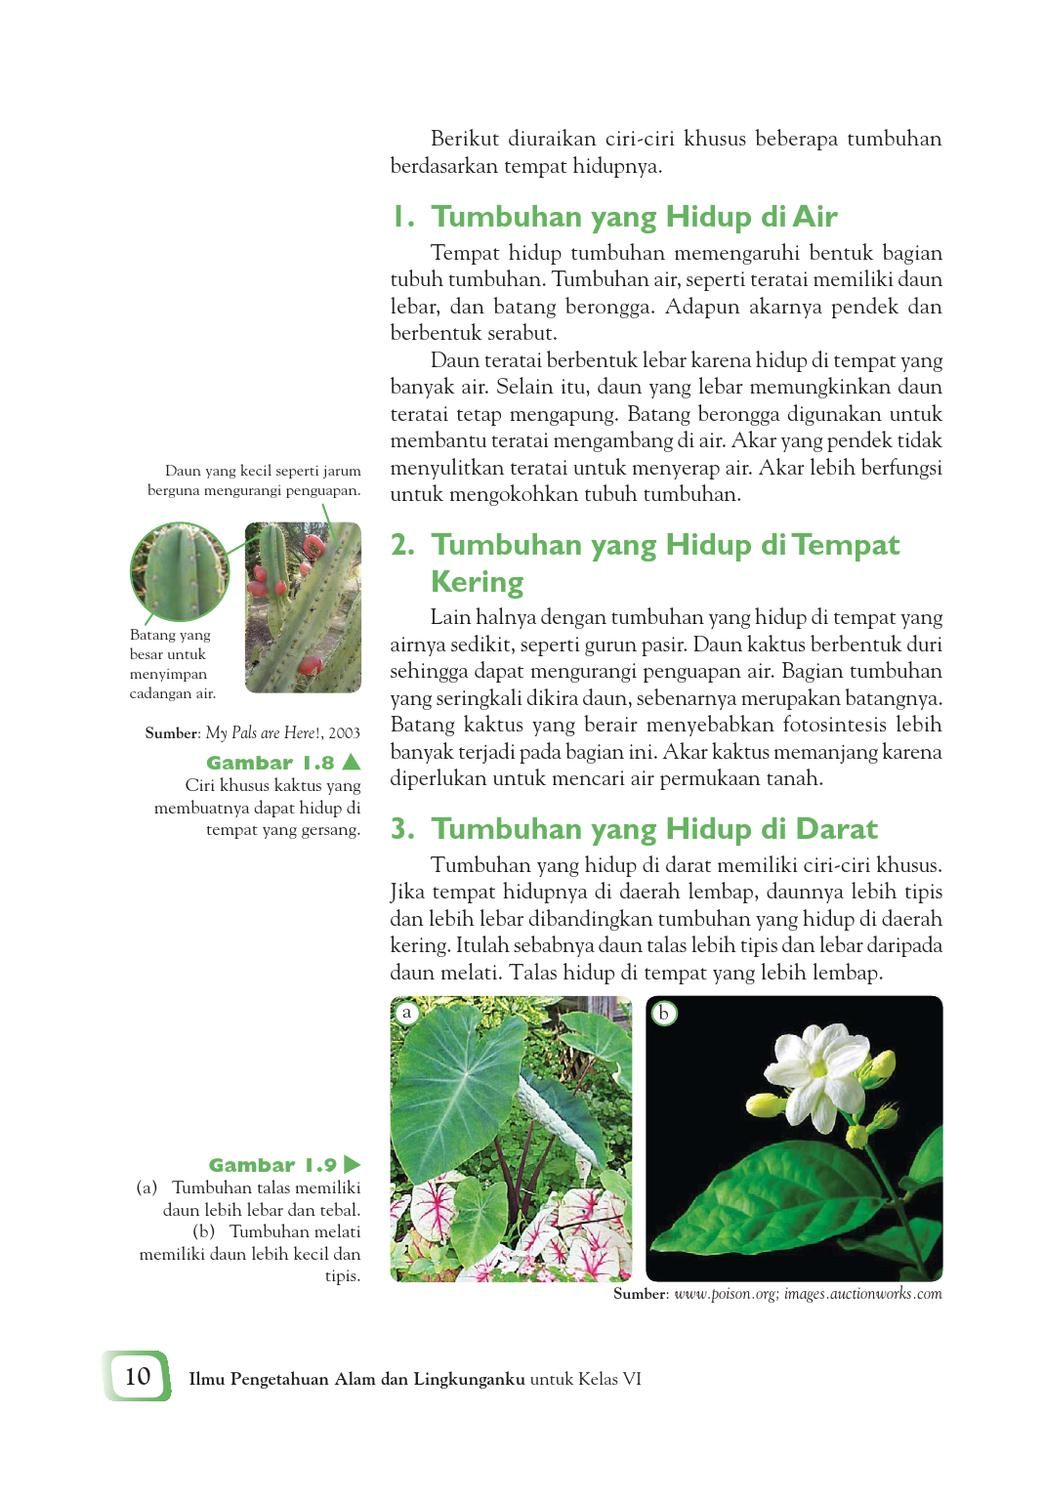 Daun Daun Pada Kaktus Berbentuk : kaktus, berbentuk, Kelas, Pengetahuan, Mulyati, Arifin, Herawati, Issuu